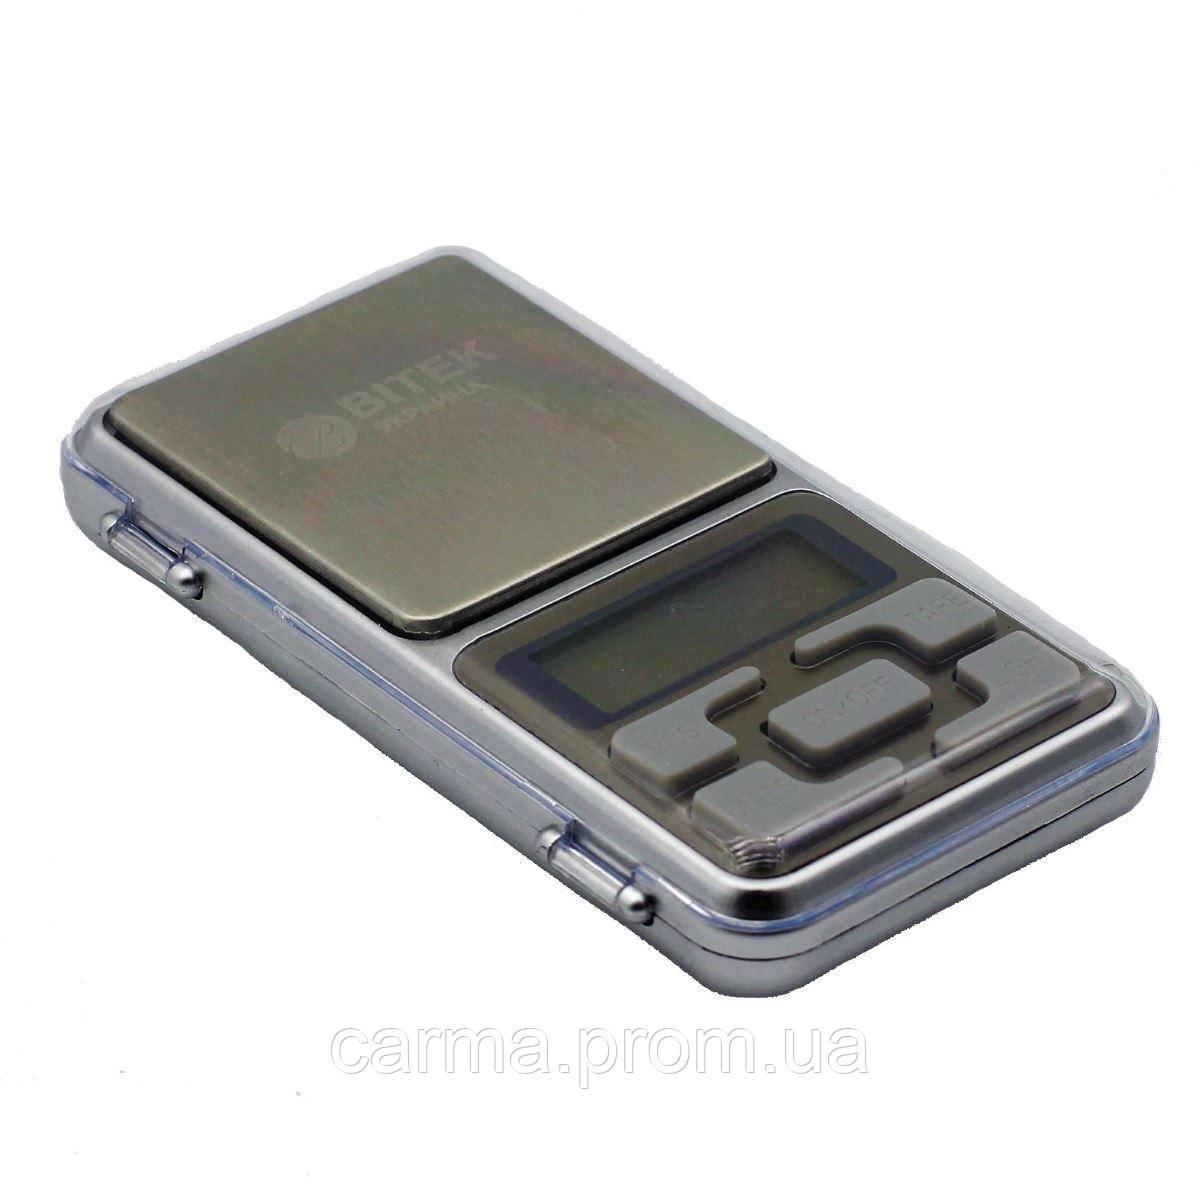 Карманные ювелирные весы Pocket Scale MH 200 г